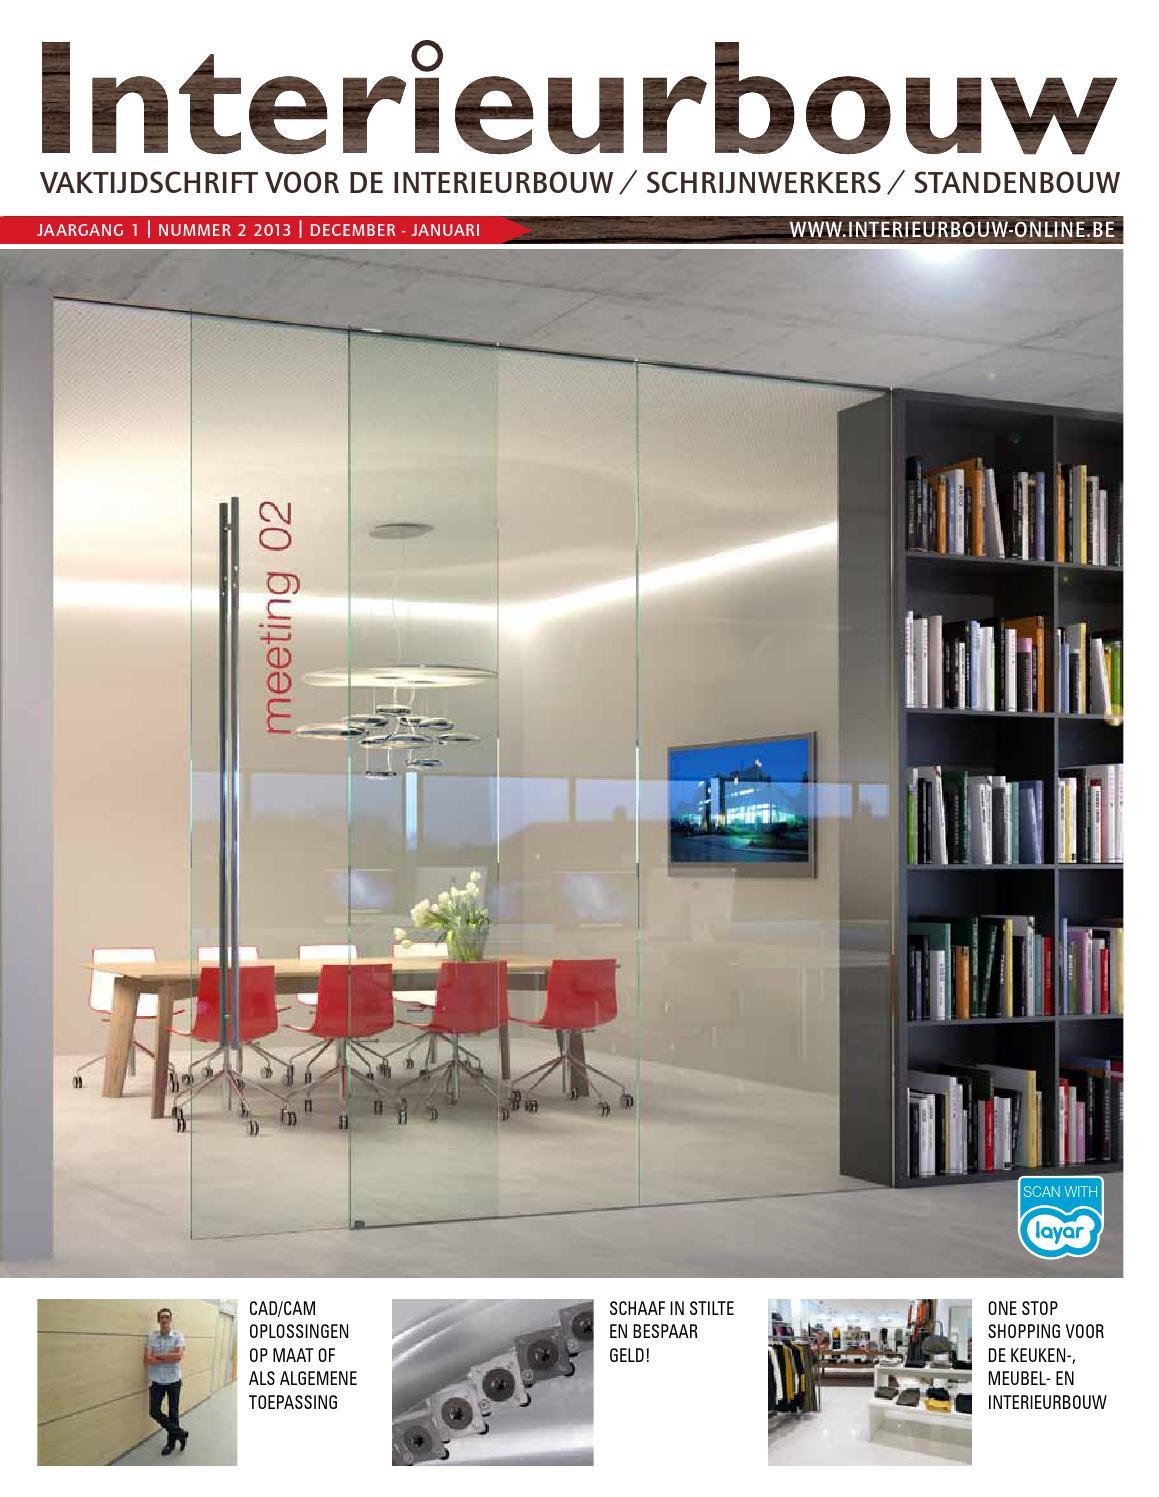 Interieurbouw be 03 2014 by louwers uitgeversorganisatie bv   issuu